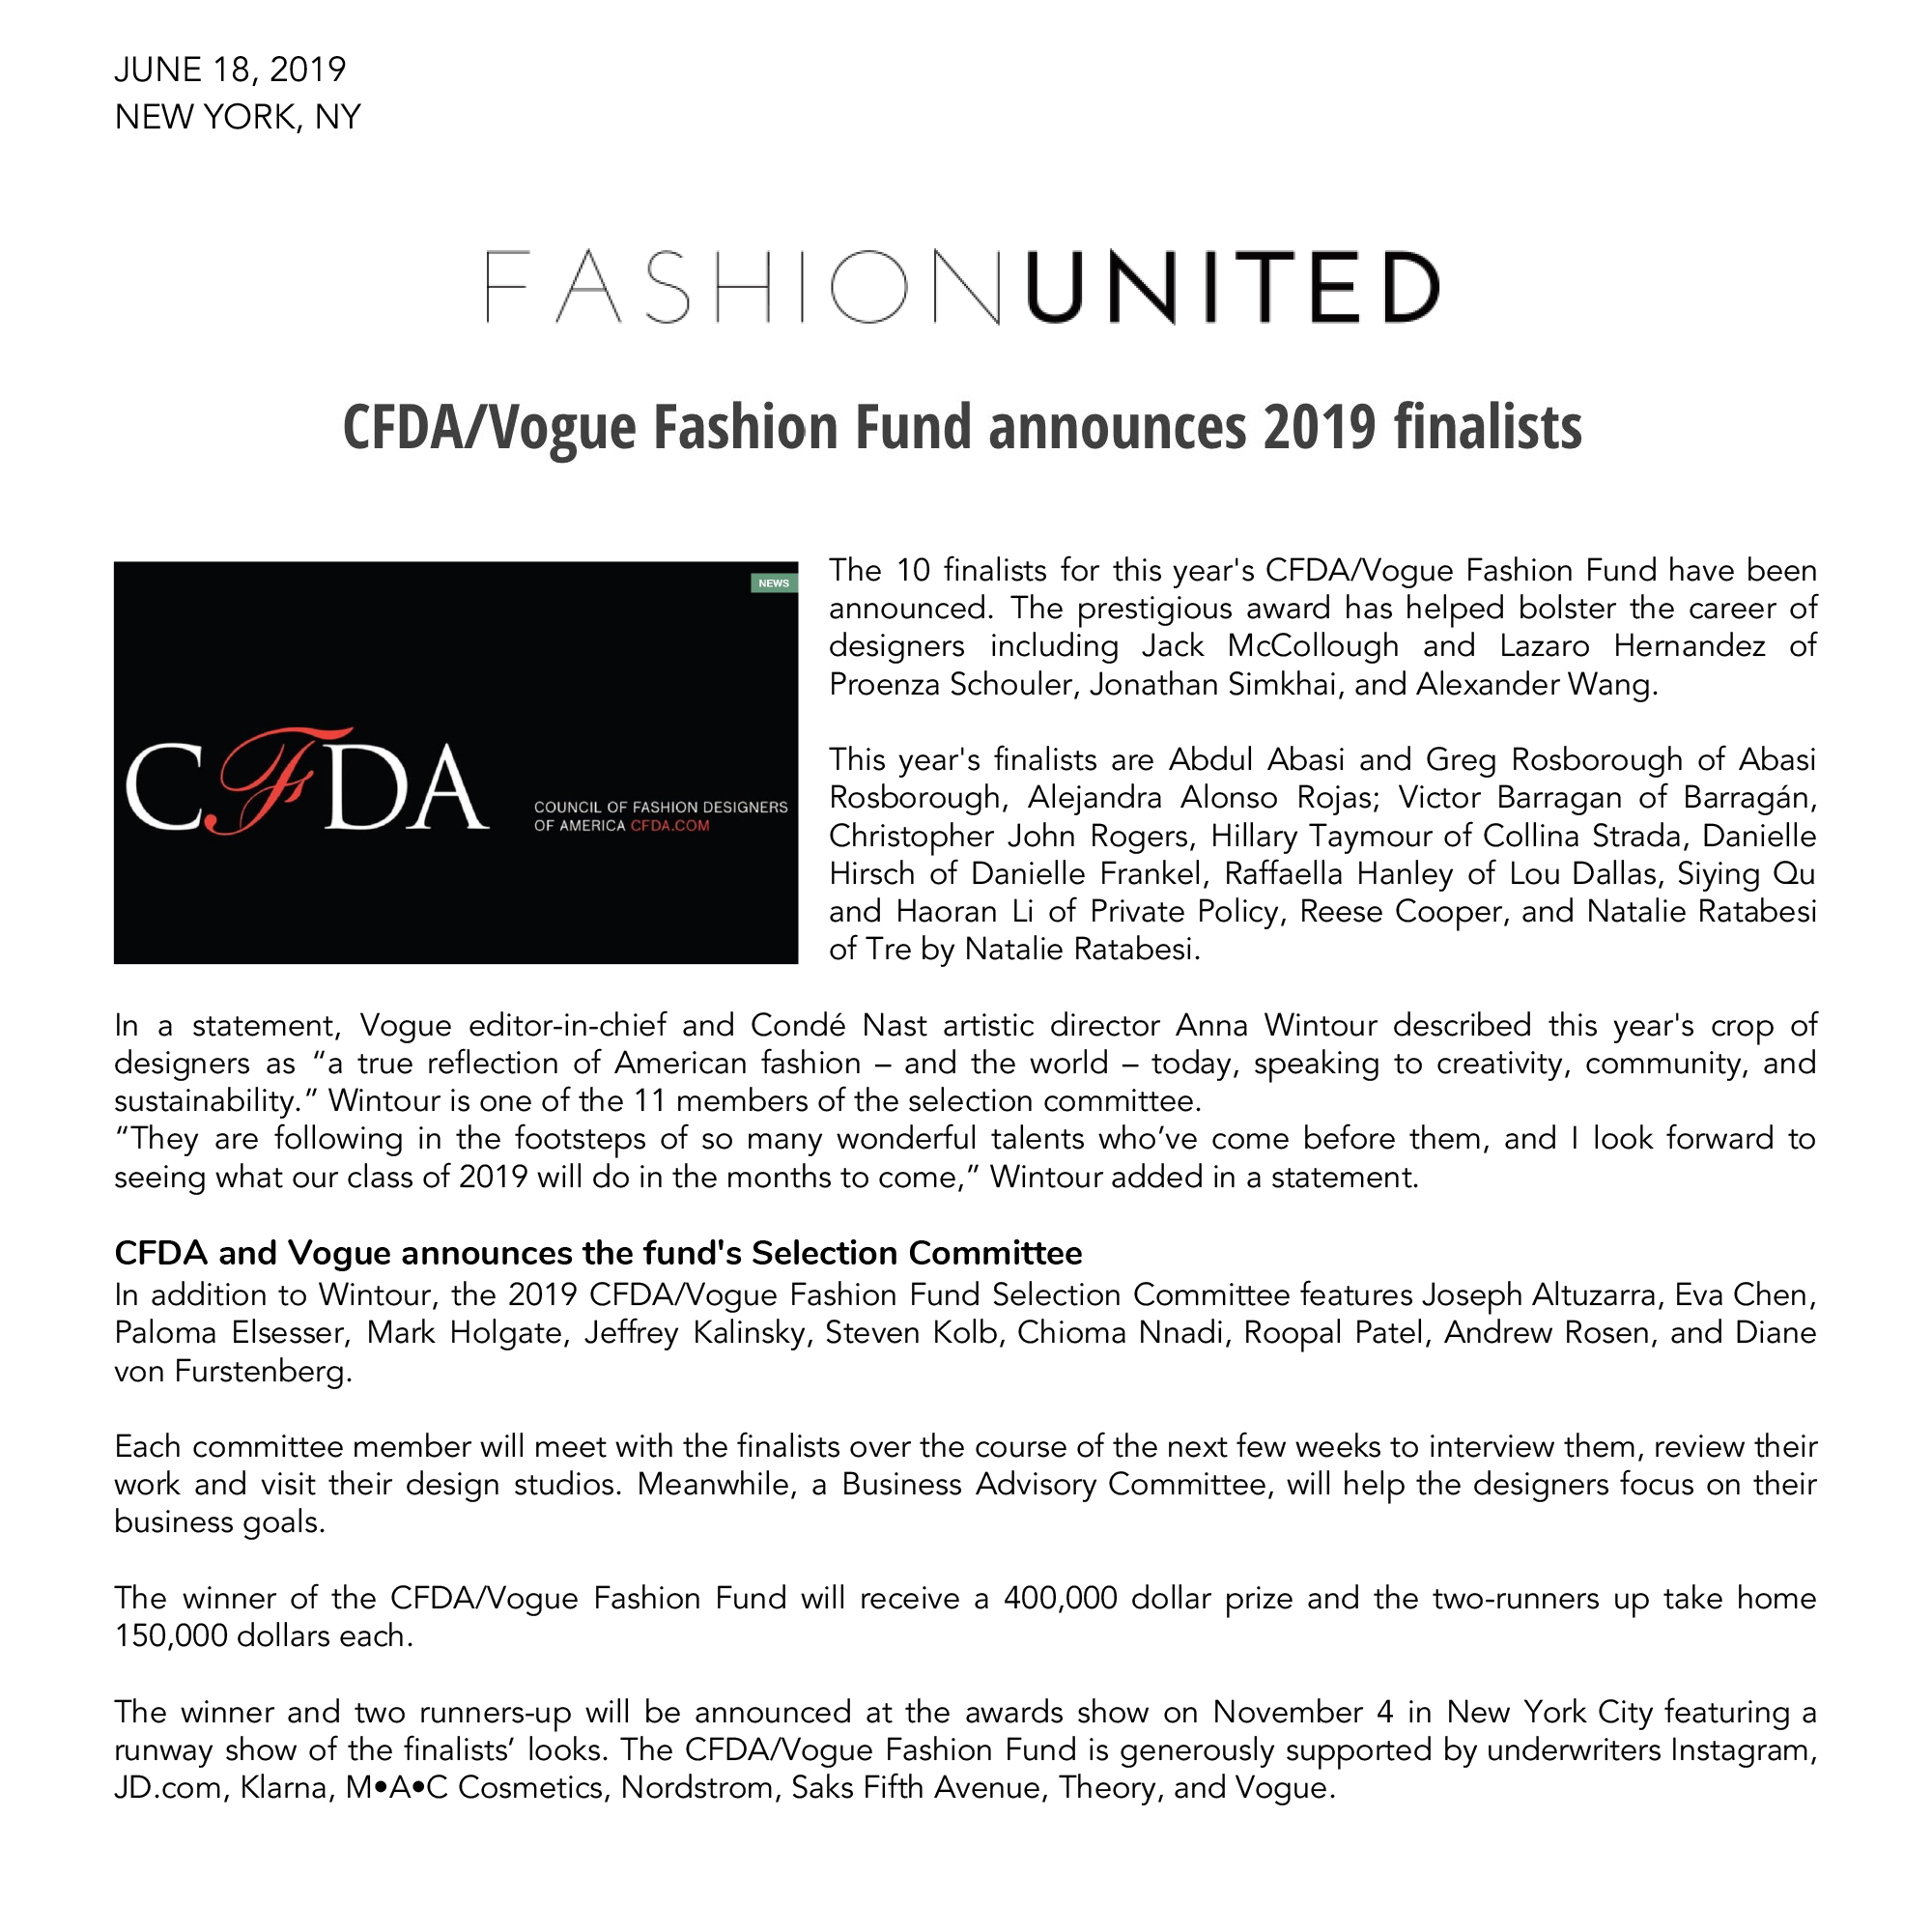 CFDA Fashion United.jpg